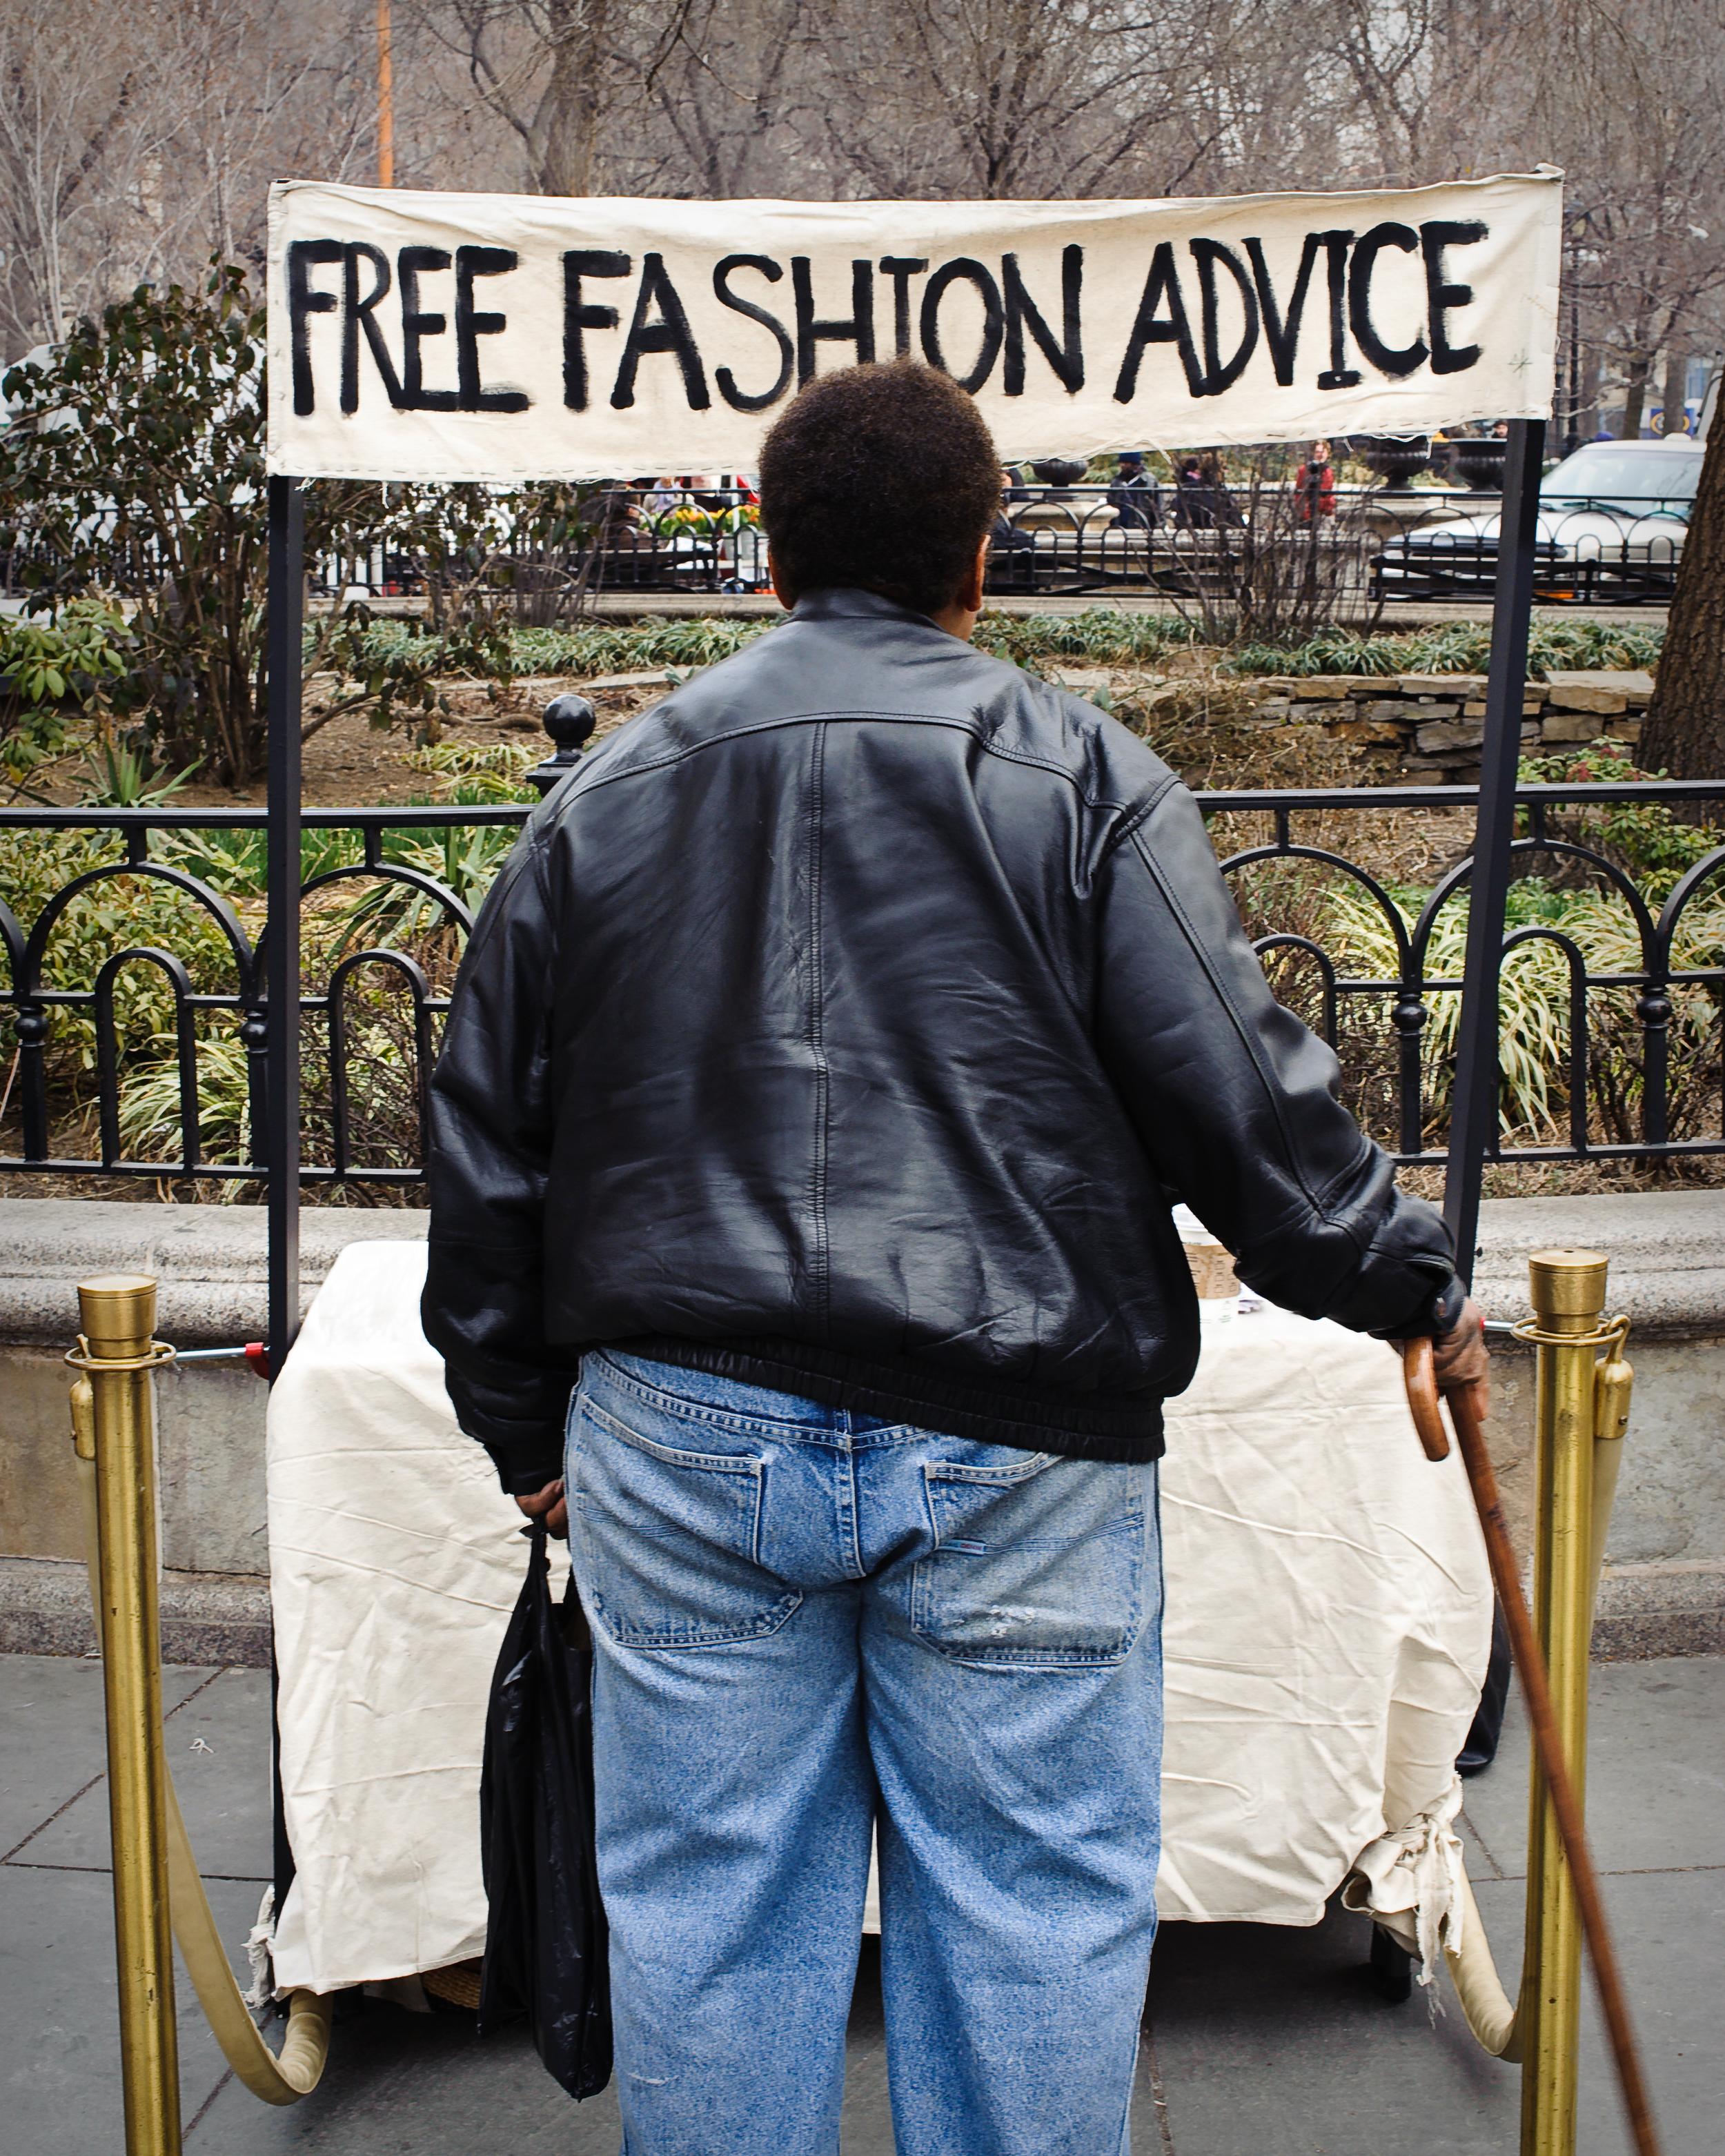 Free Fashion Advice